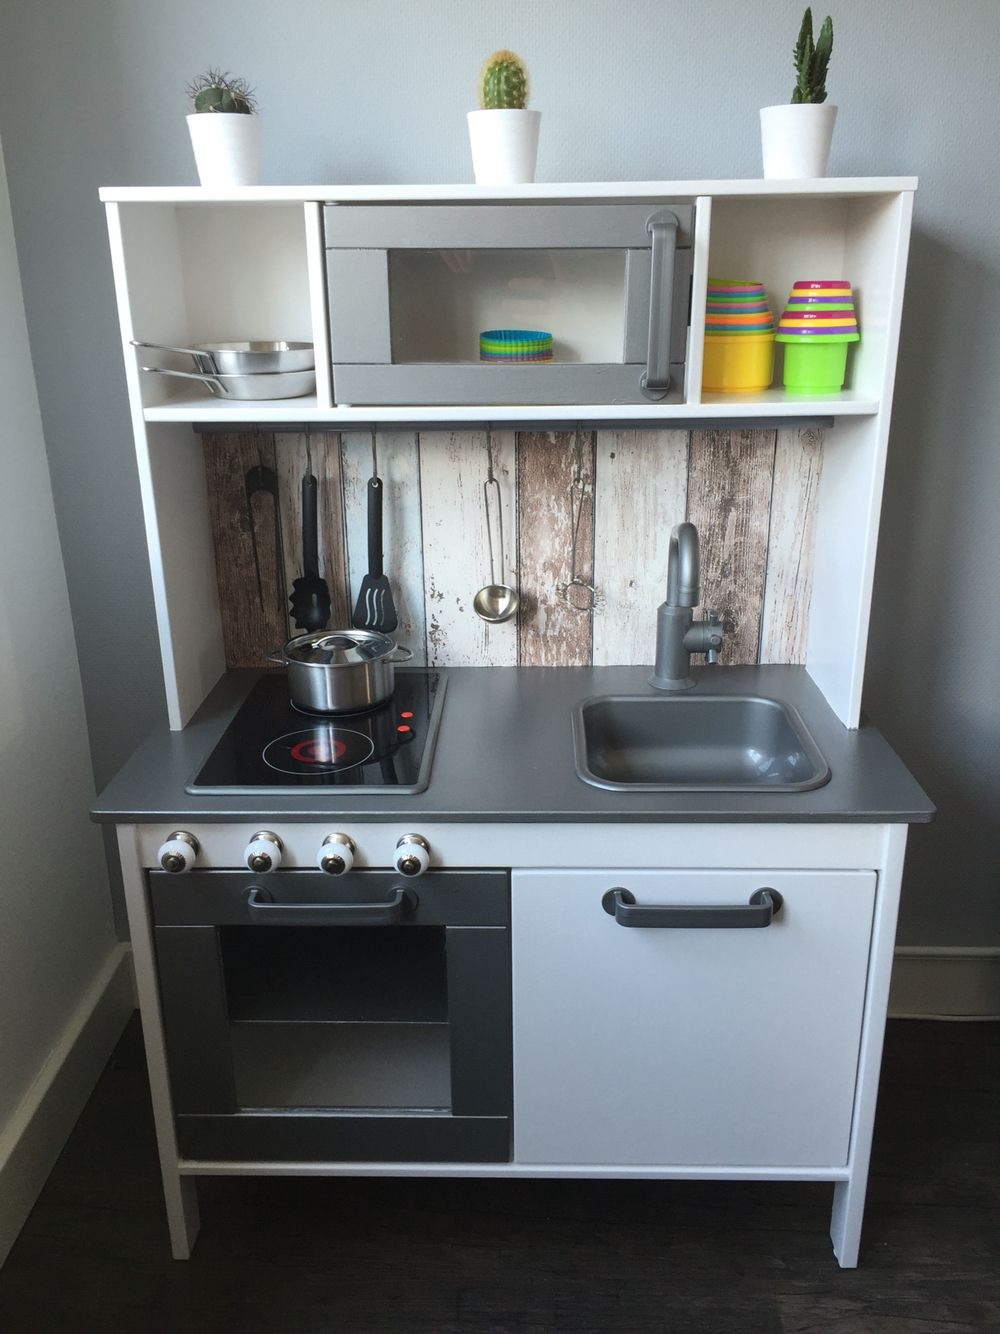 ikea speel keukentje ikea spielk che pinterest. Black Bedroom Furniture Sets. Home Design Ideas